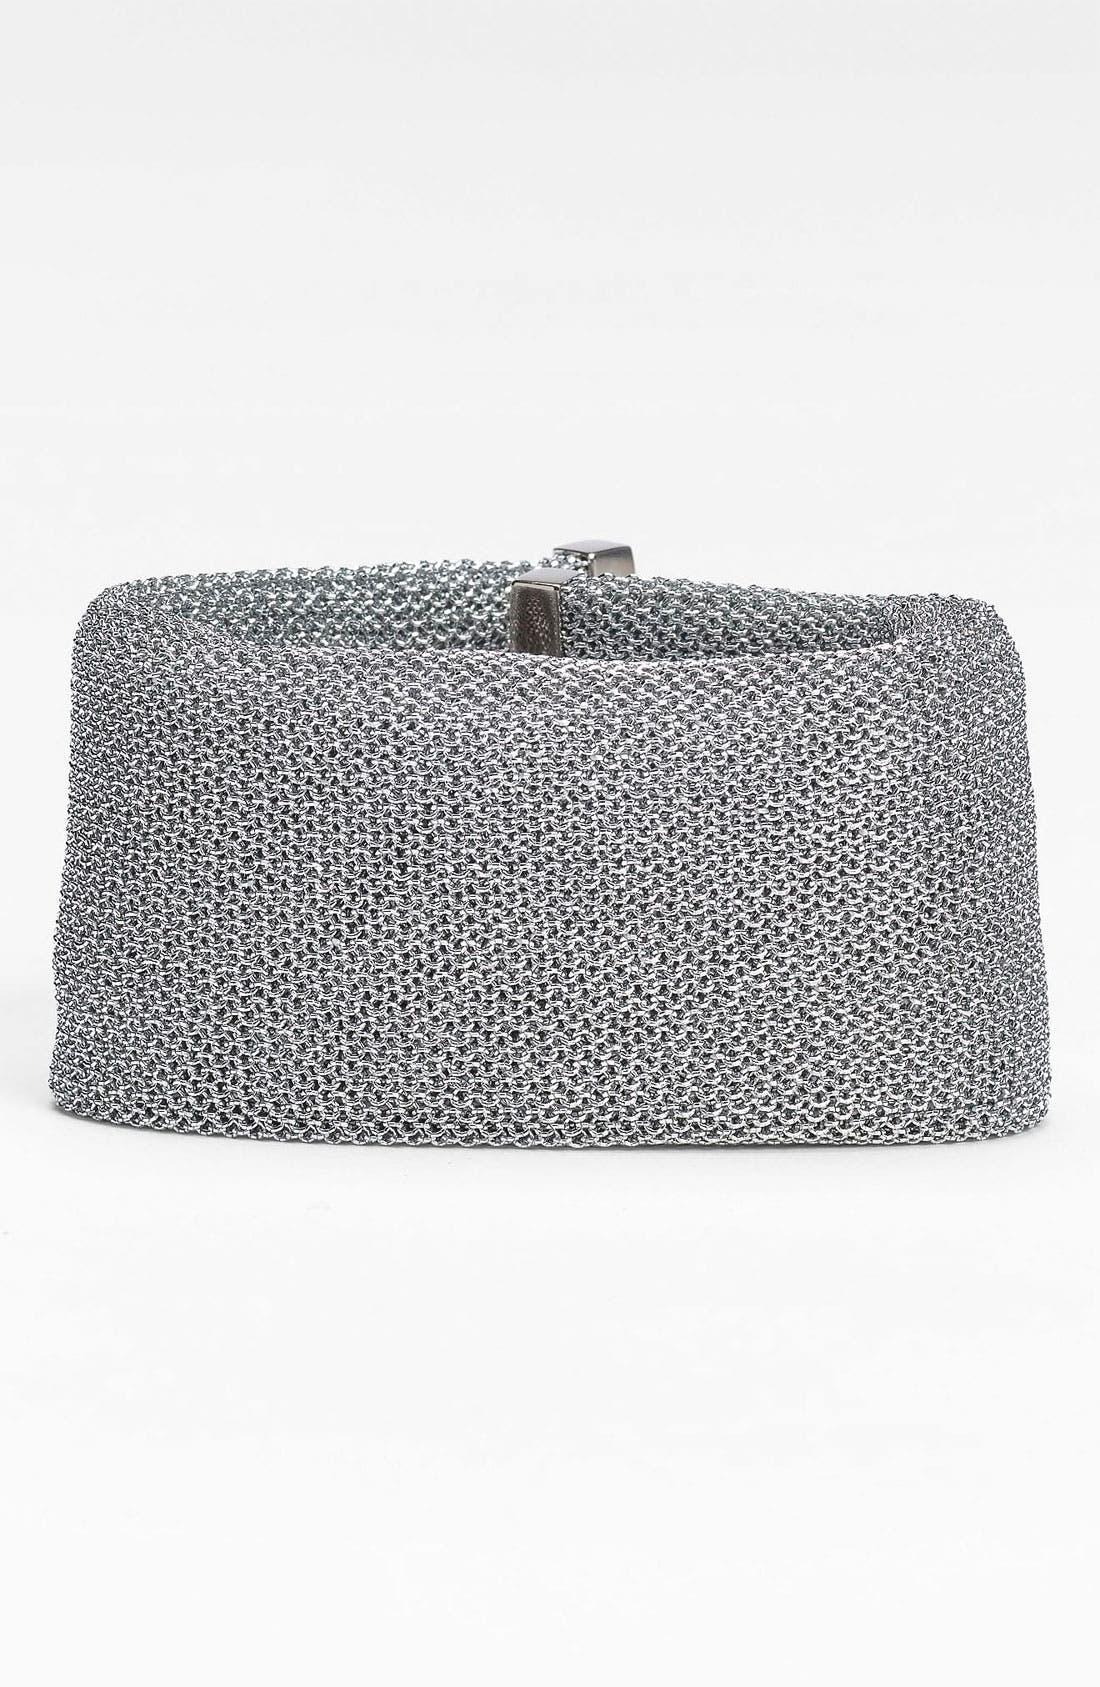 Main Image - Adami & Martucci 'Mesh' Line Bracelet